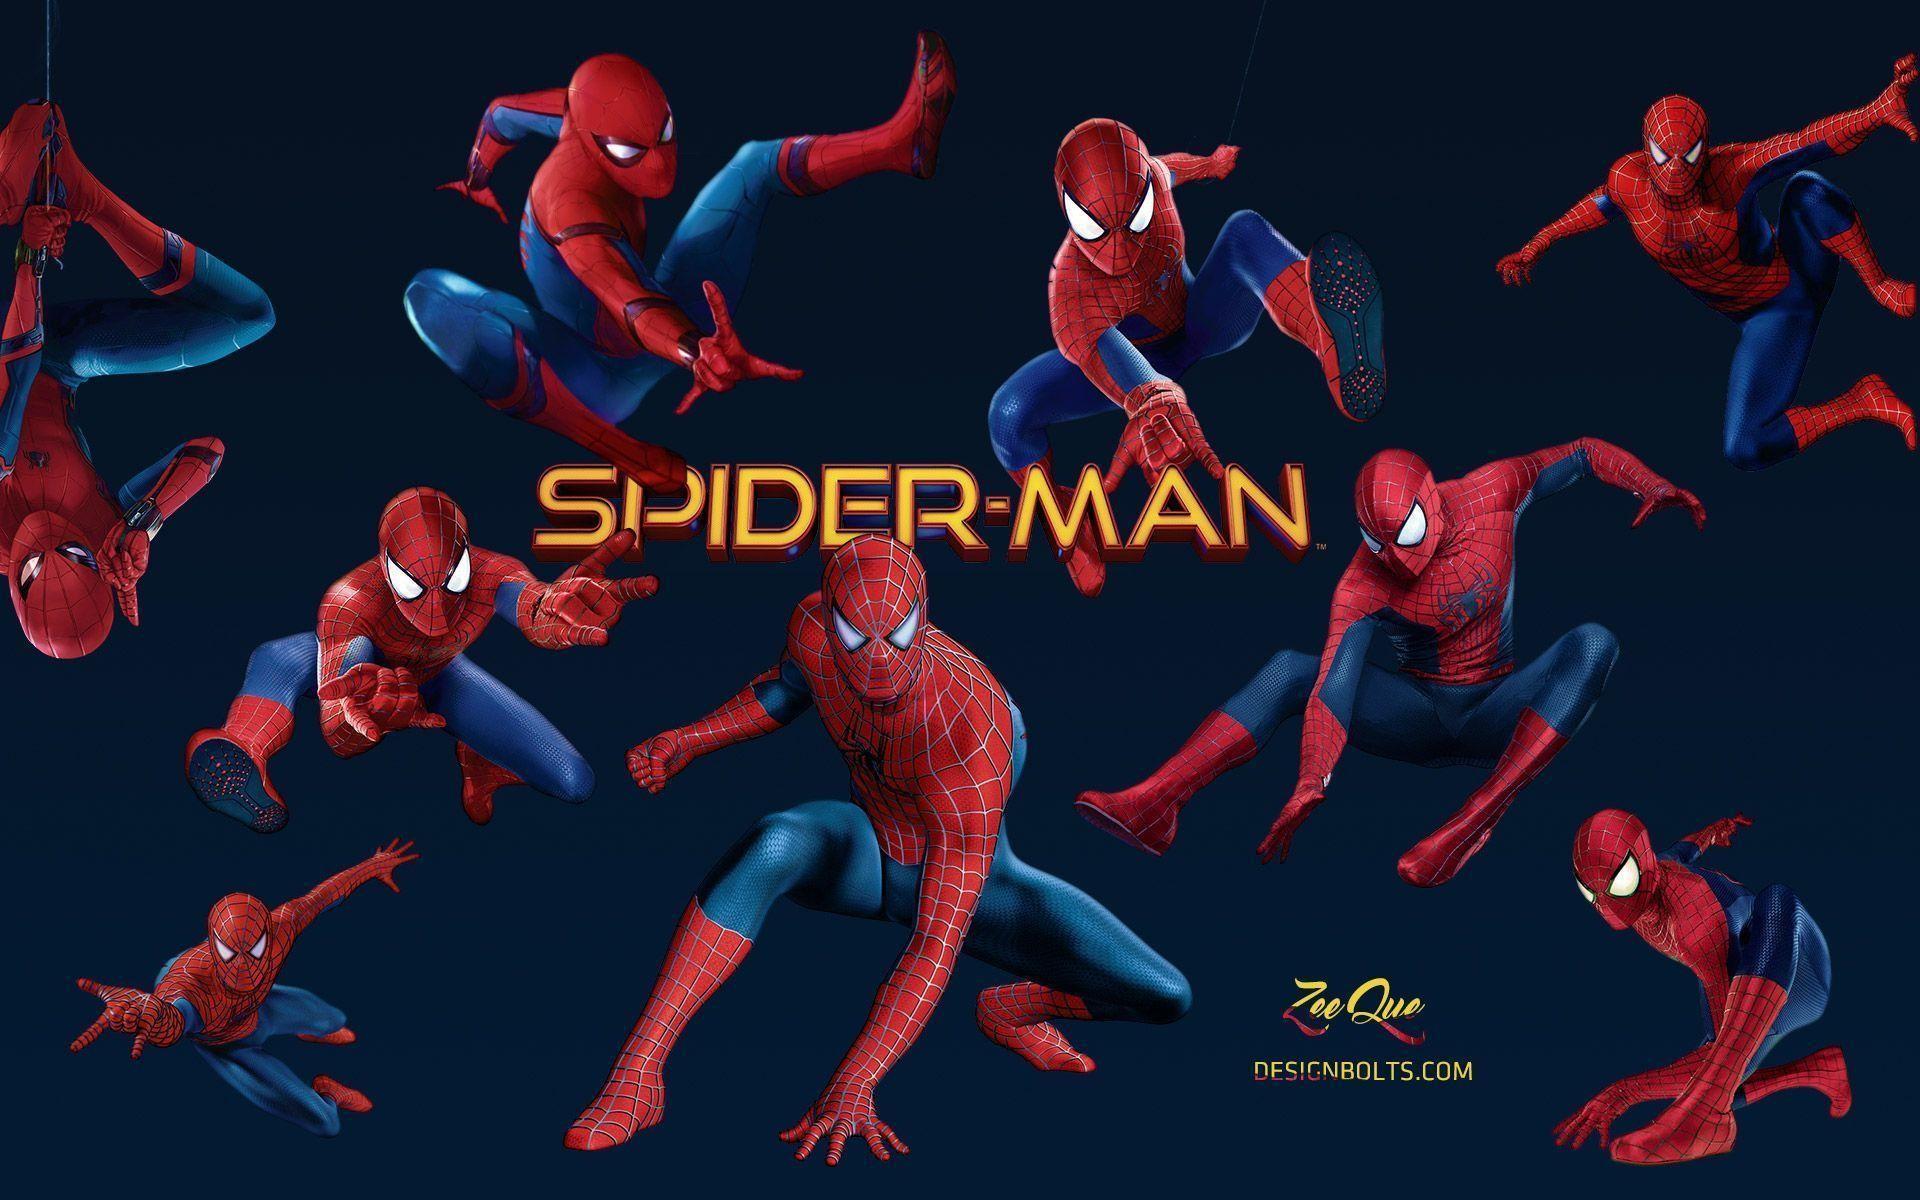 Spiderman: HD Spider Man Desktop Wallpapers (67+ Images